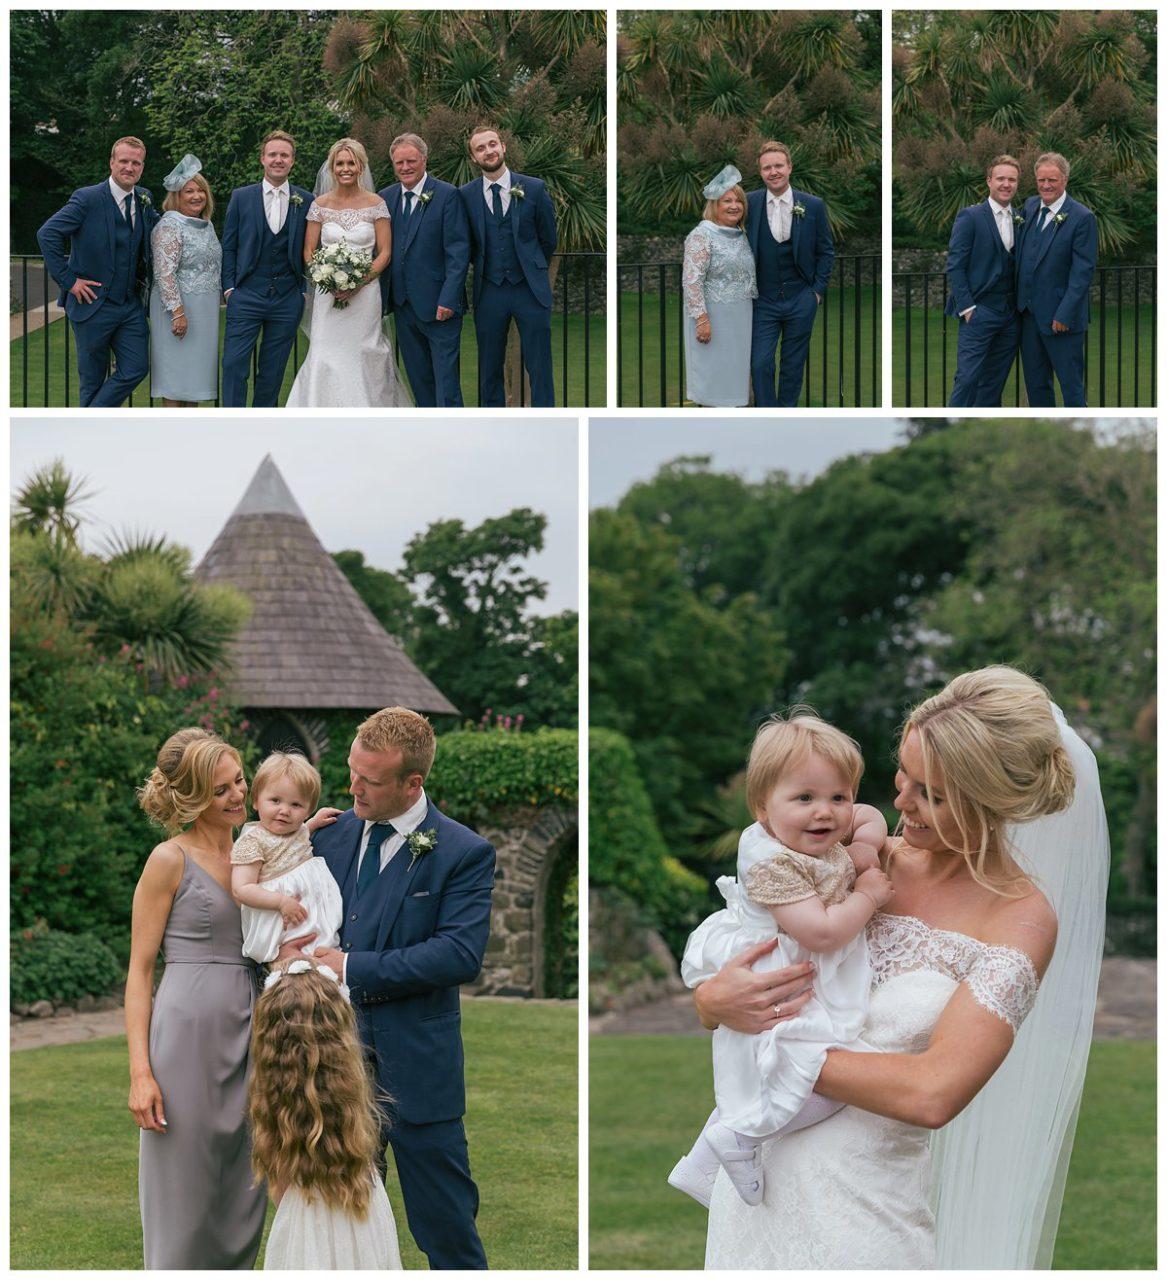 ballygally_castle_wedding_photography_0062.jpg